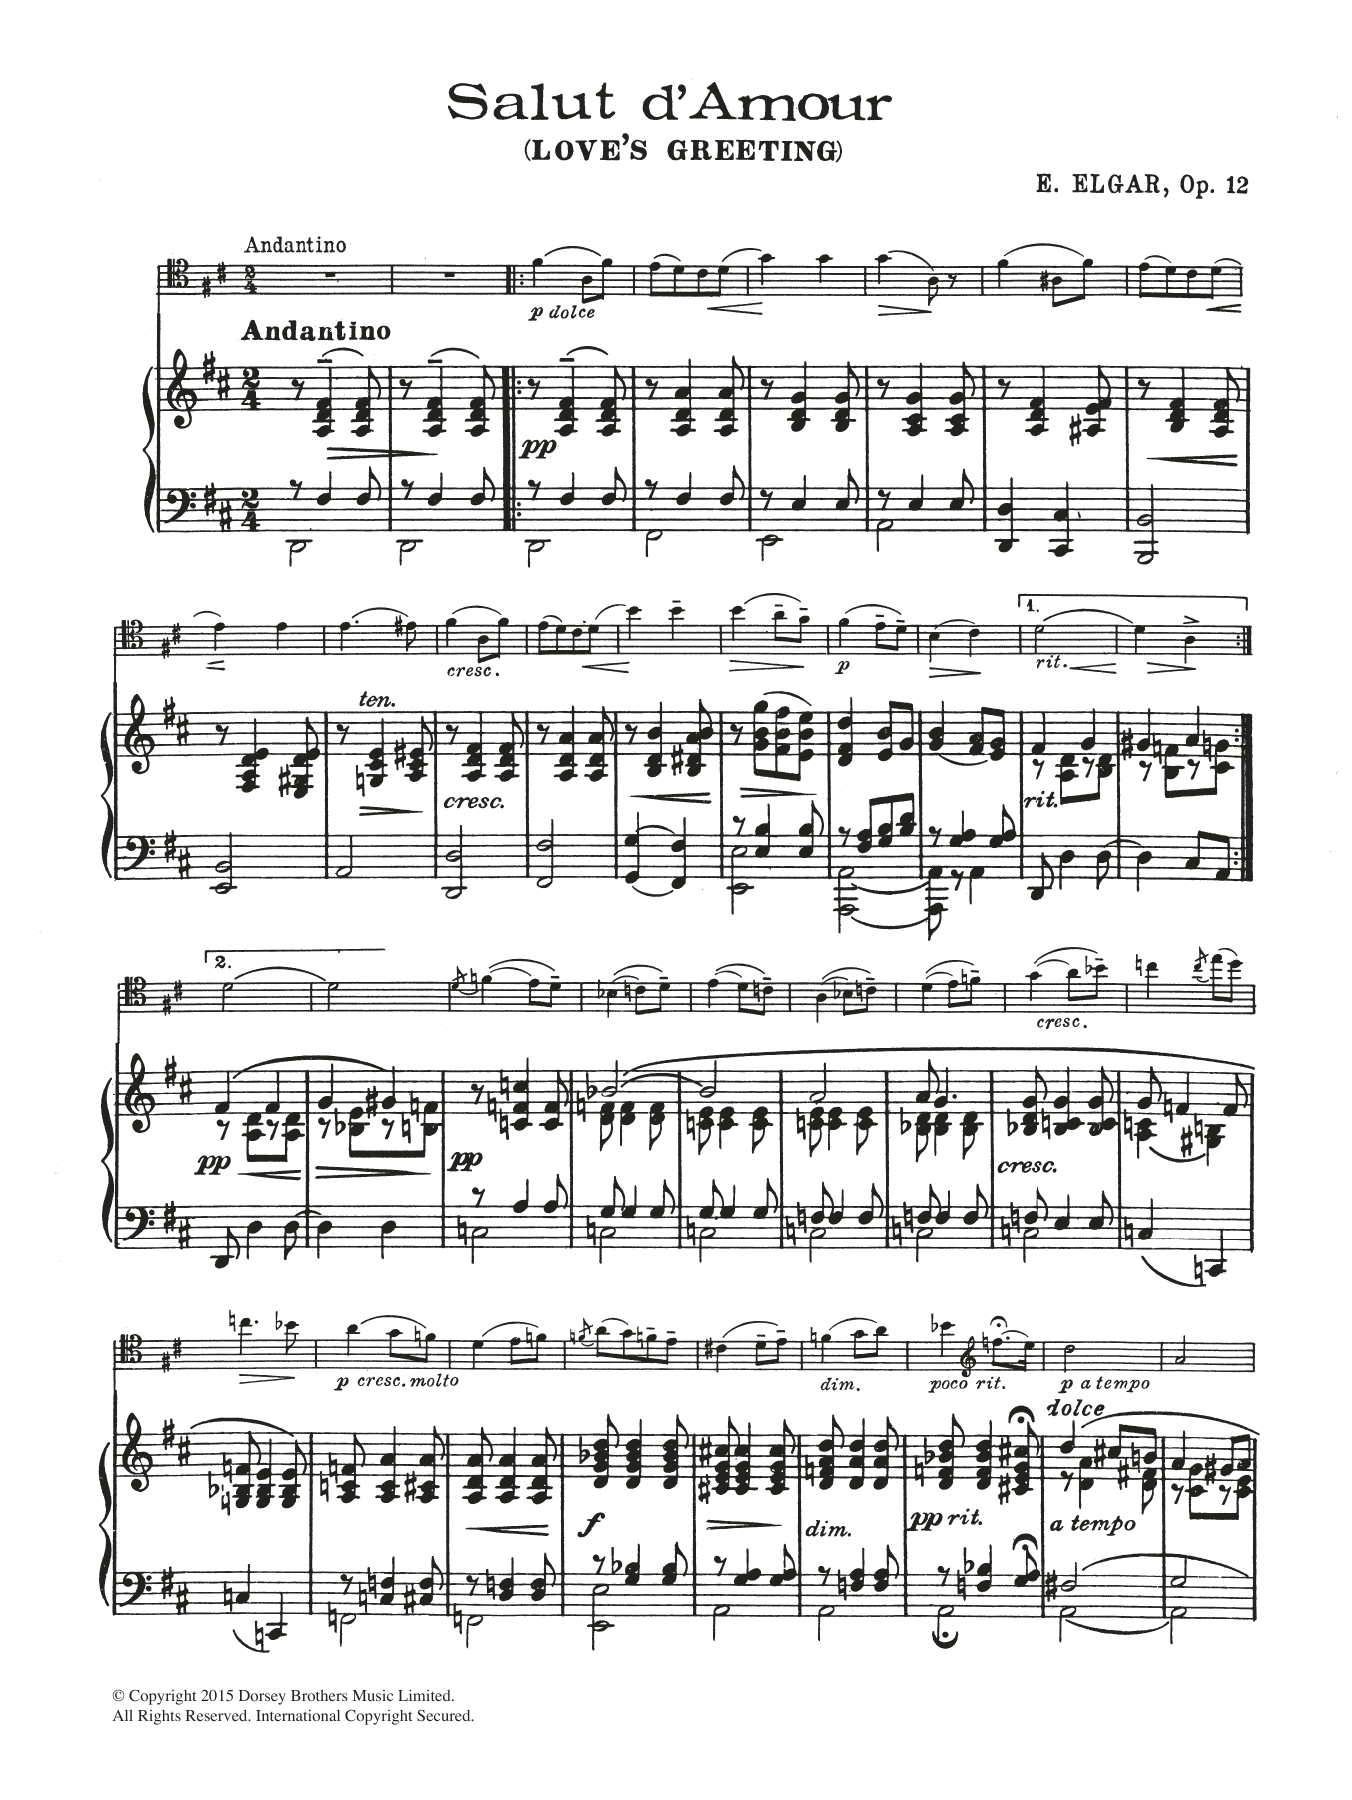 Edward Elgar - Salut D'Amour